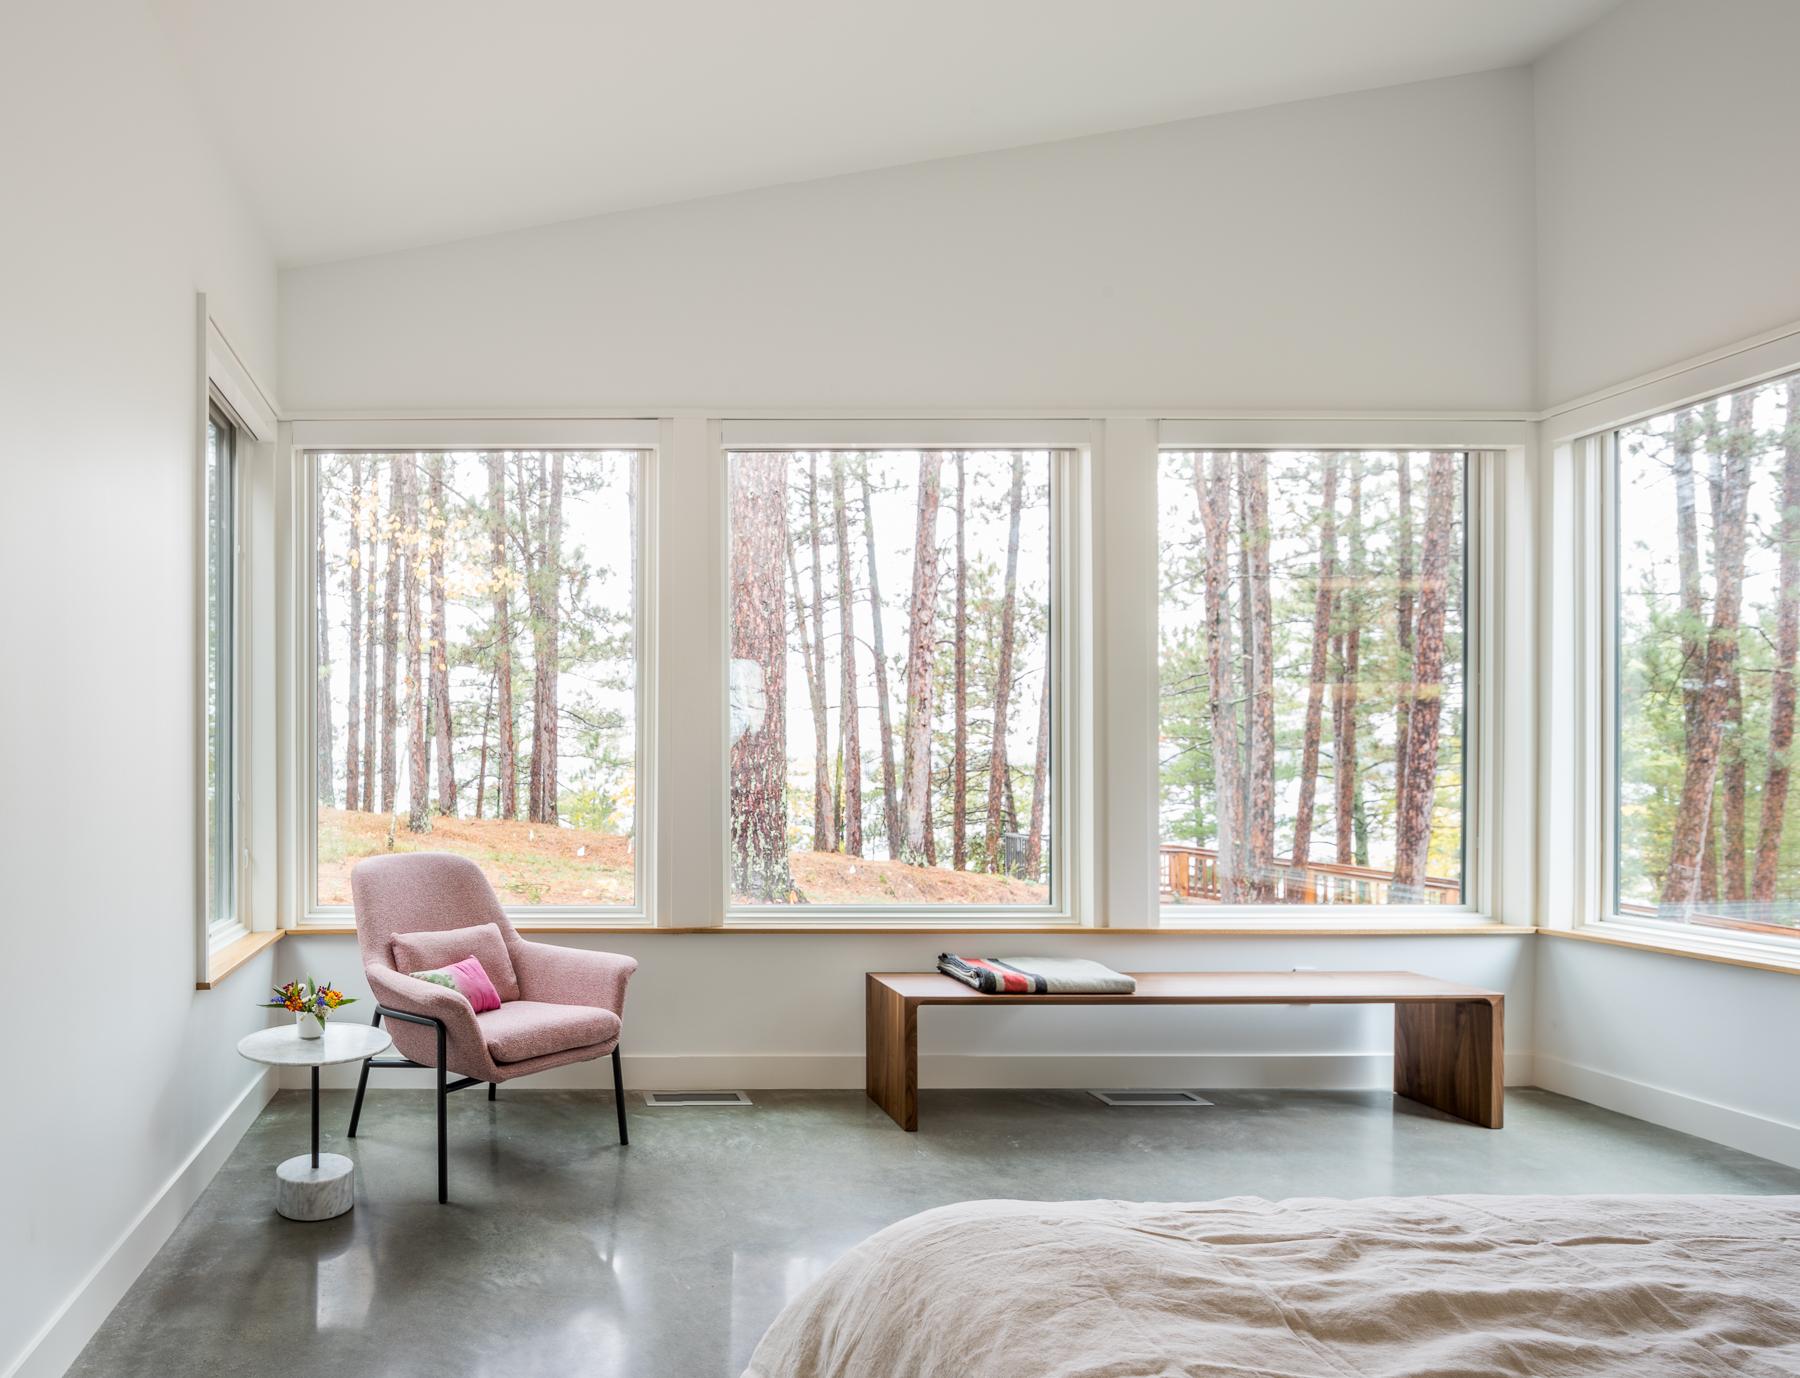 This Scandinavia Inspired Lake Home Is A Sweet Modern